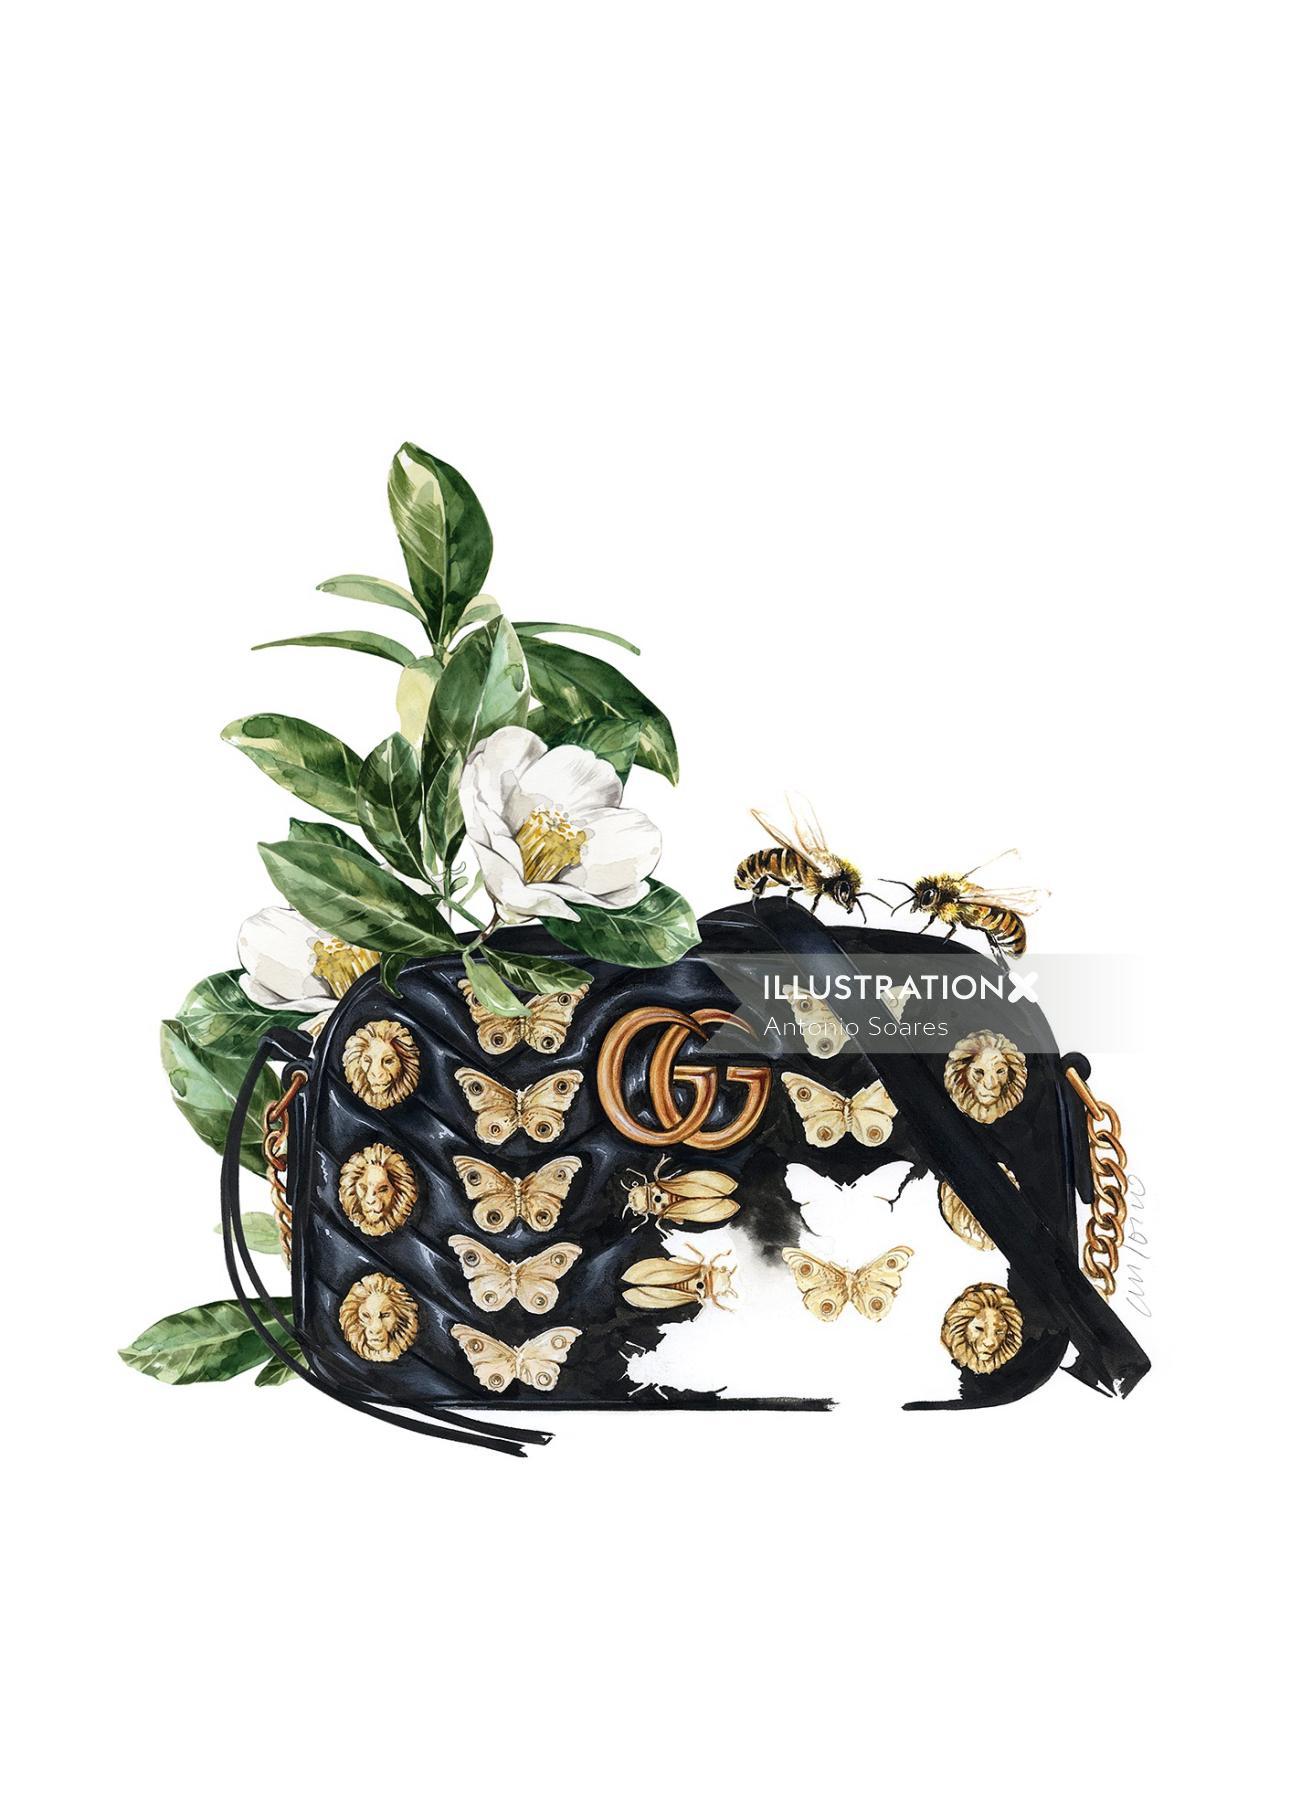 An Illustration For Gucci Handbag